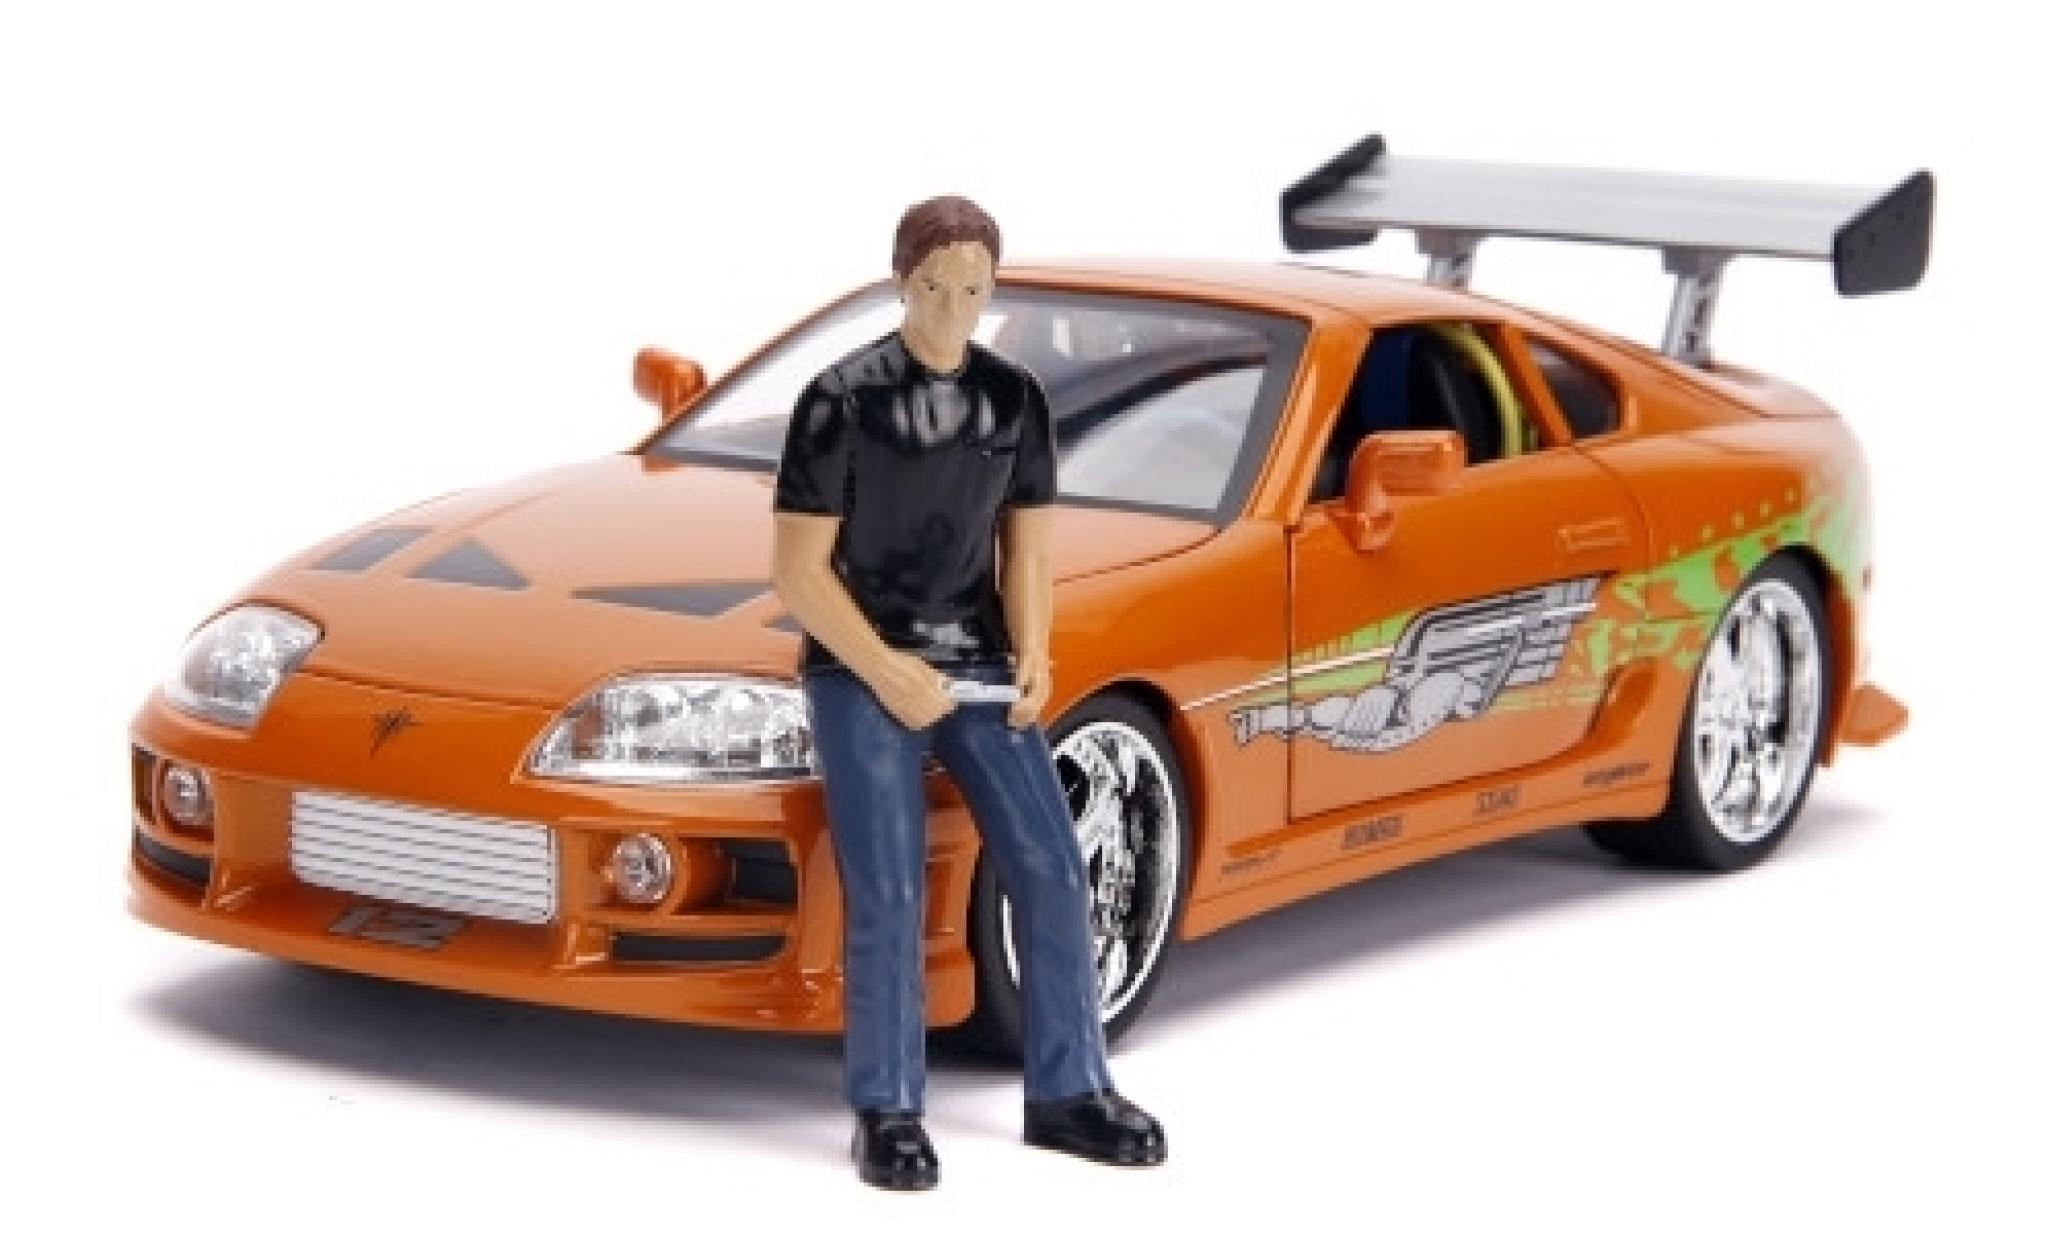 Toyota Supra 1/18 Jada metallise orange/Dekor Fast & Furious 1995 avec figurine et Scheinwerferfunktion